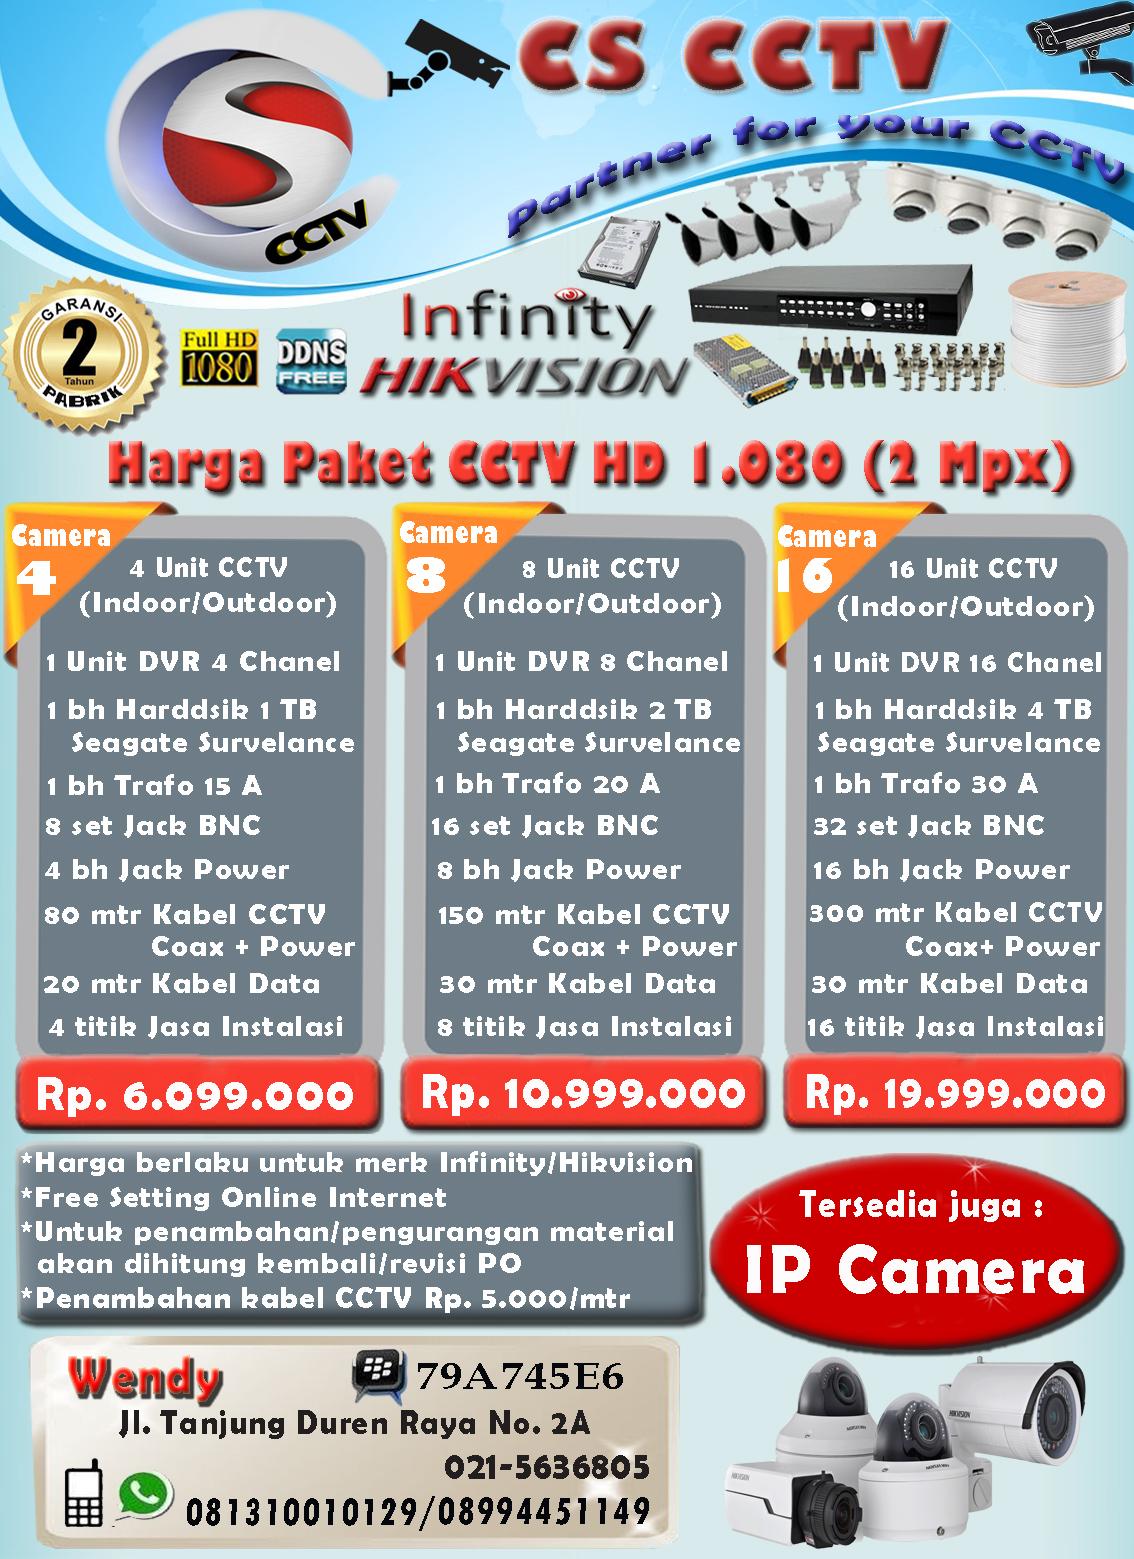 Brosur CCTV & Price